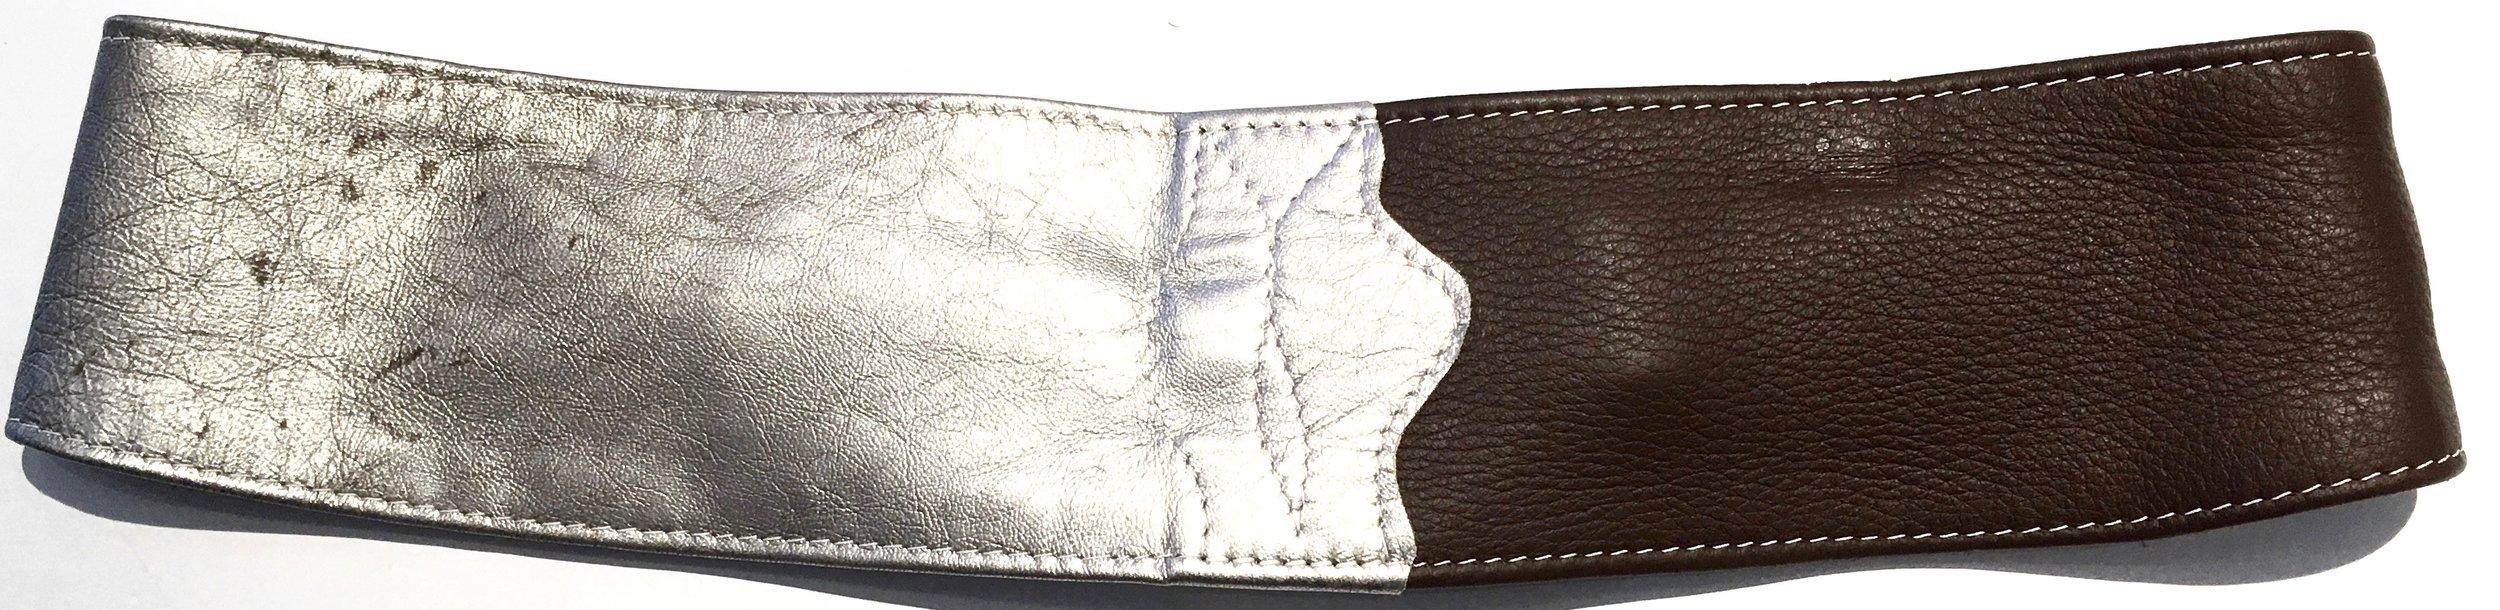 Brown deerskin and silver metallic lambkin HipWear.  One of a kind horse bit design and adjustable velcro closure. Back view..jpg